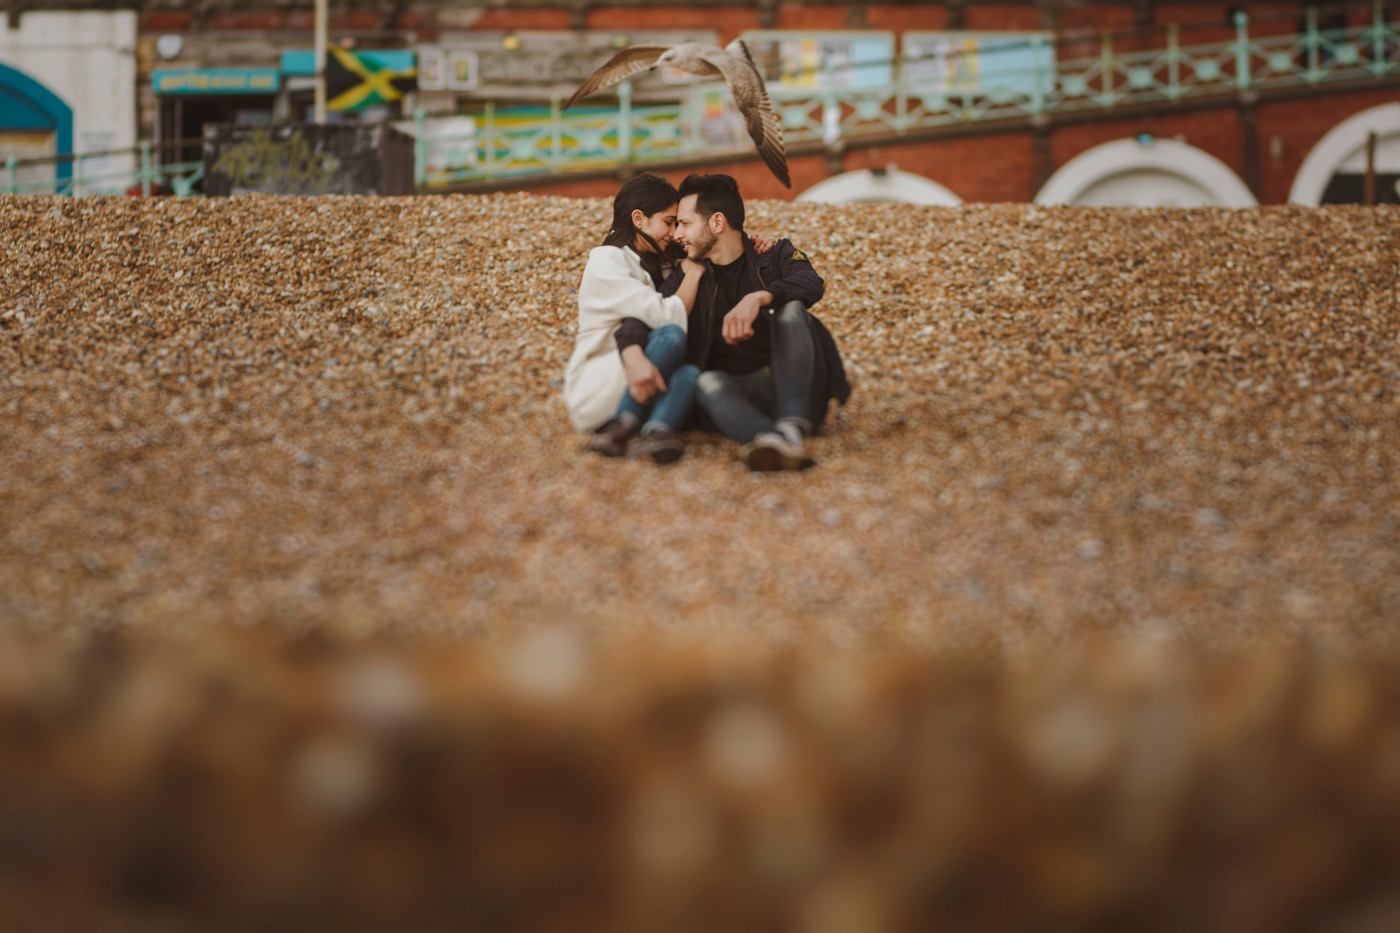 brigton-engagement-photography9.JPG